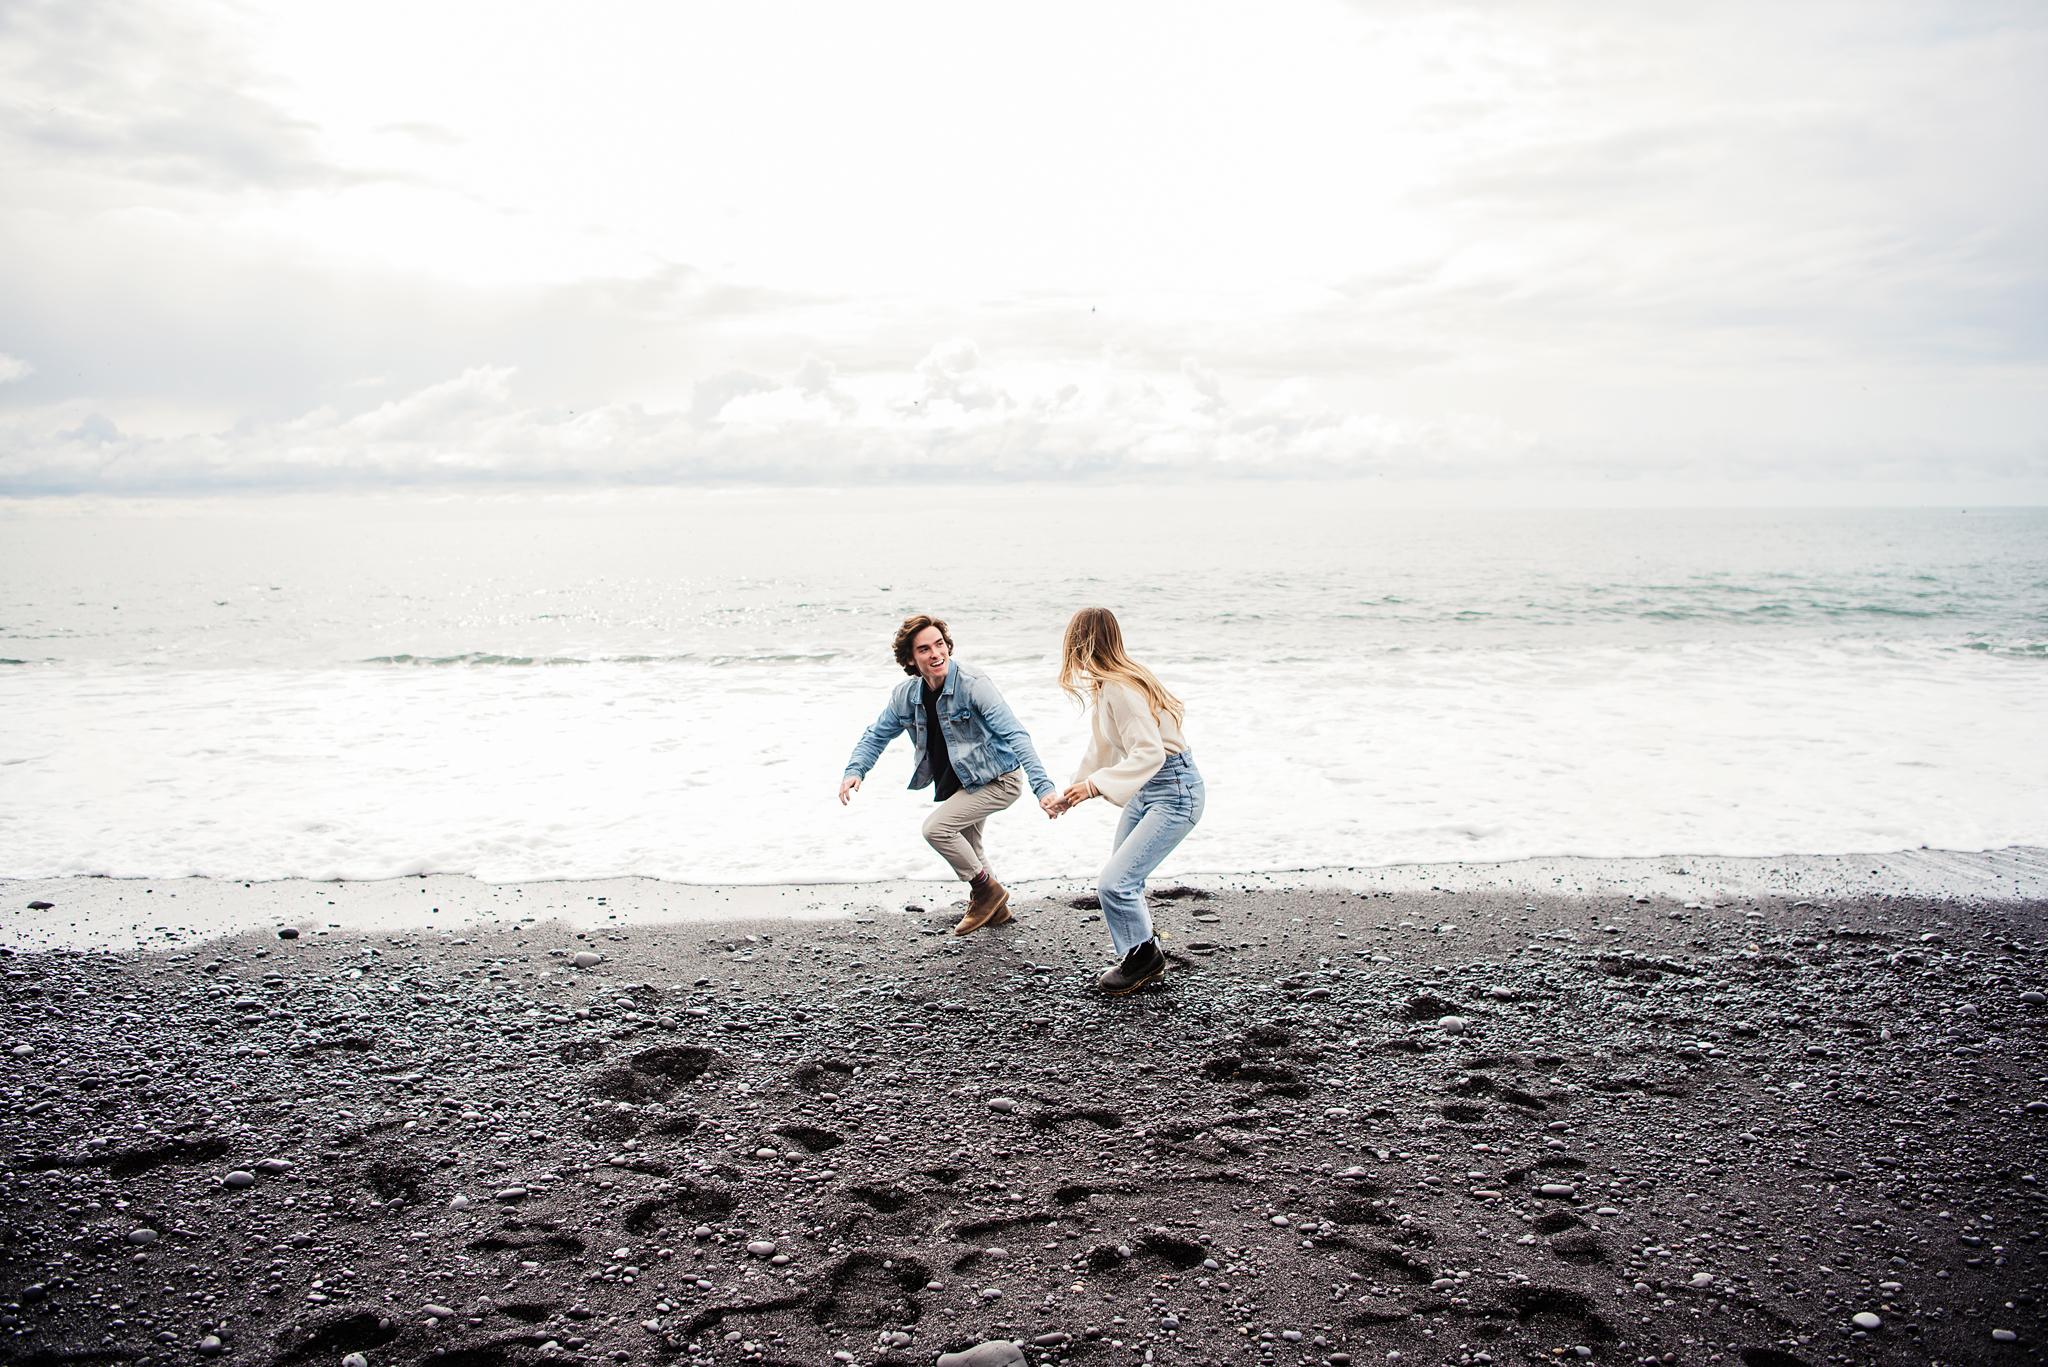 Iceland_Reynisfjara_Black_Sand_Beach_Couples_Session_JILL_STUDIO_Rochester_NY_Photographer_DSC_9716.jpg